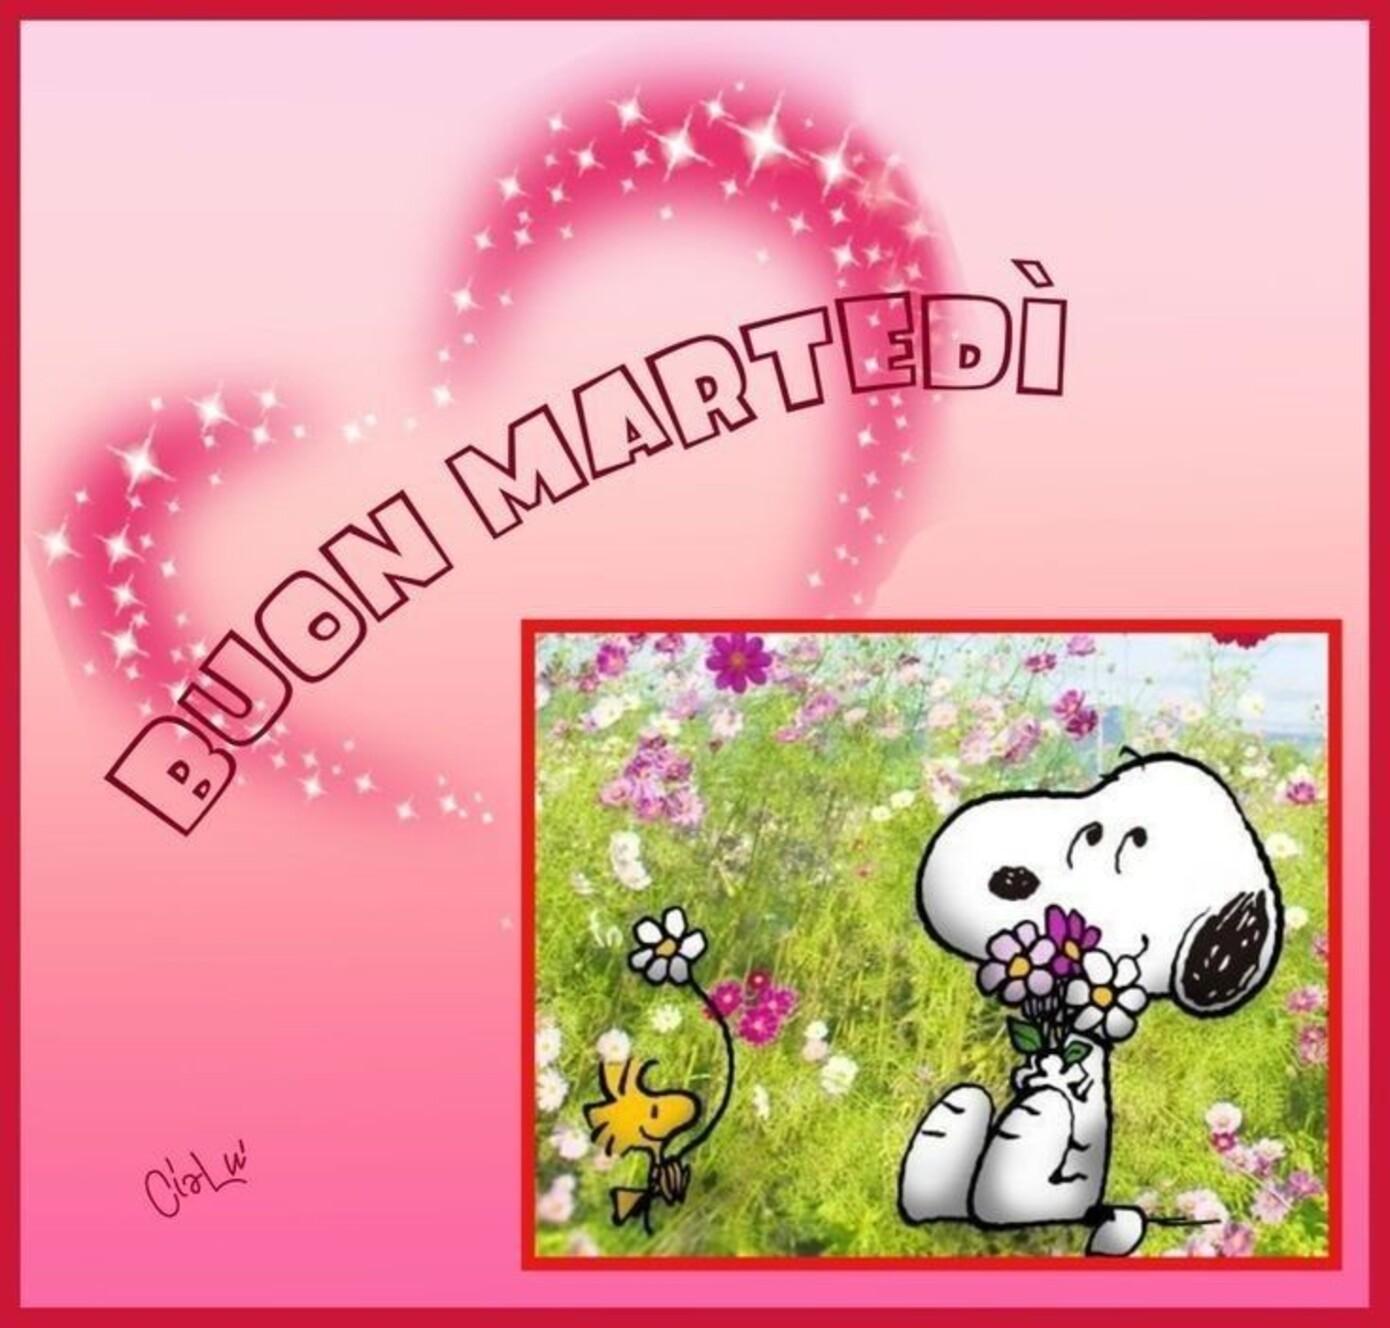 Buon Martedì Snoopy